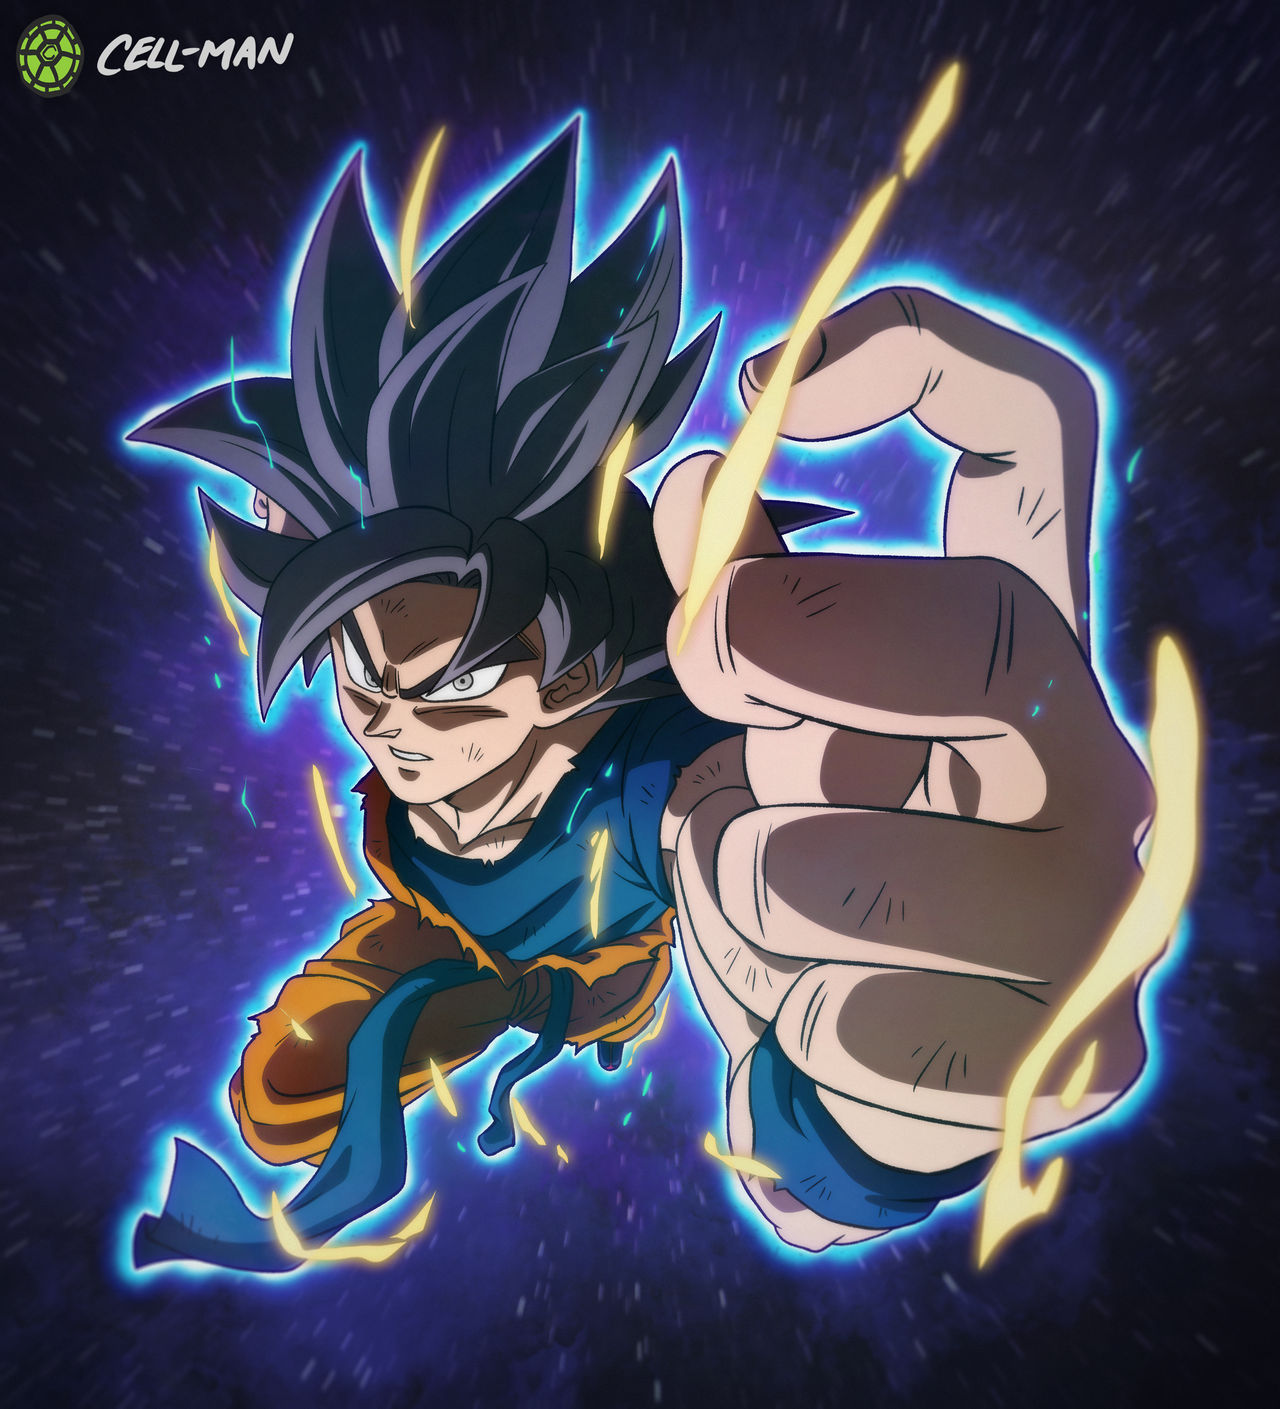 Goku: Ultra Instinct -Omen- By CELL-MAN On DeviantArt